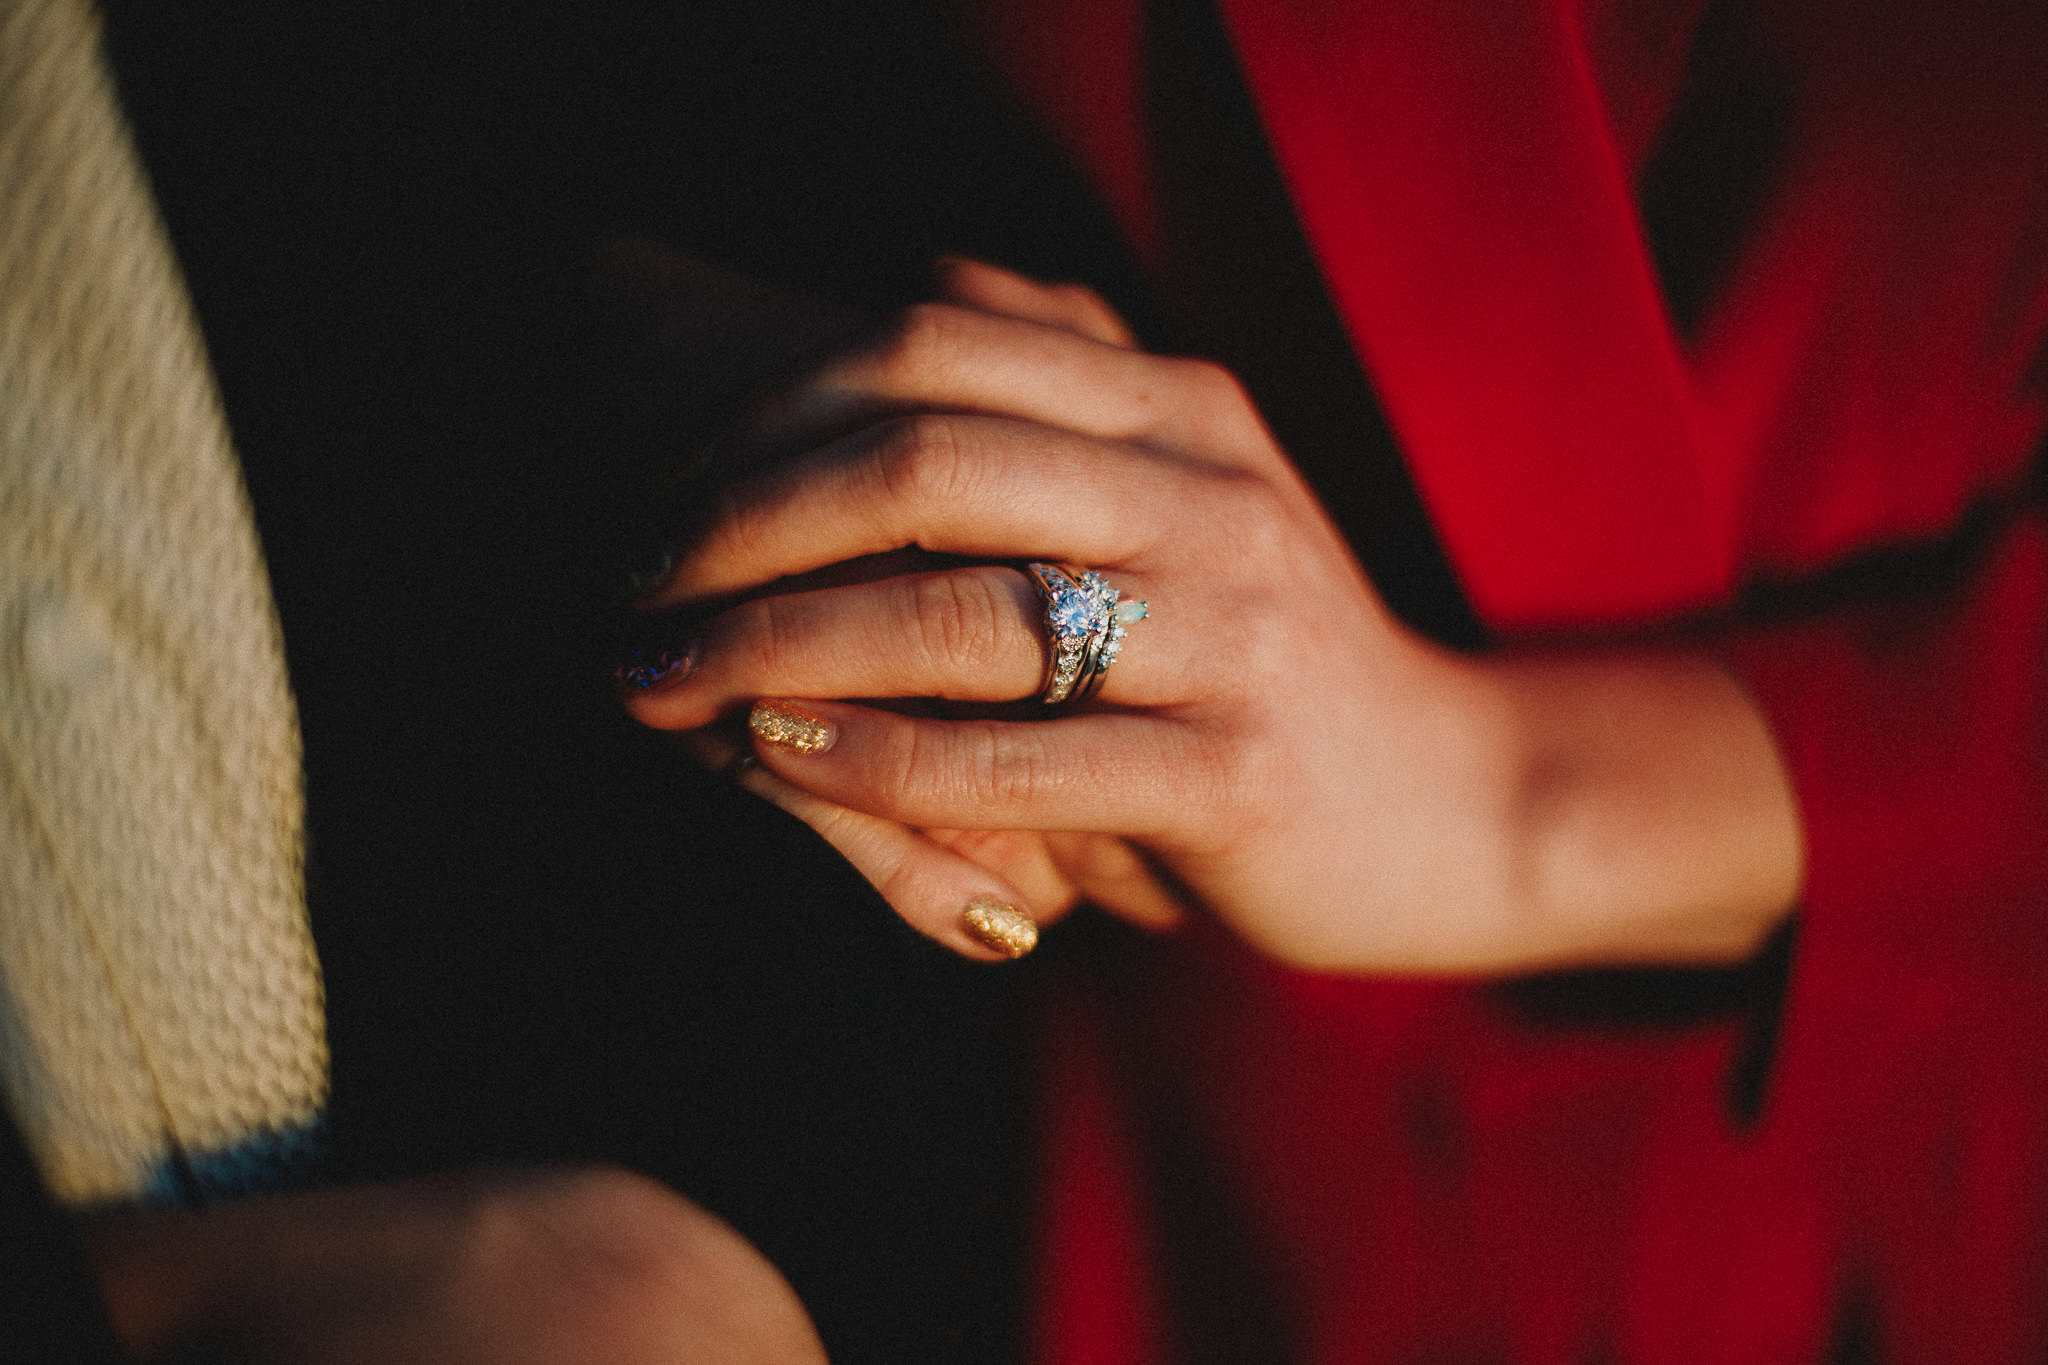 Archer Inspired Photography Carmel Beach California Wedding Engagement Lifestyle Anniversary Natural Light Photographer-74.jpg